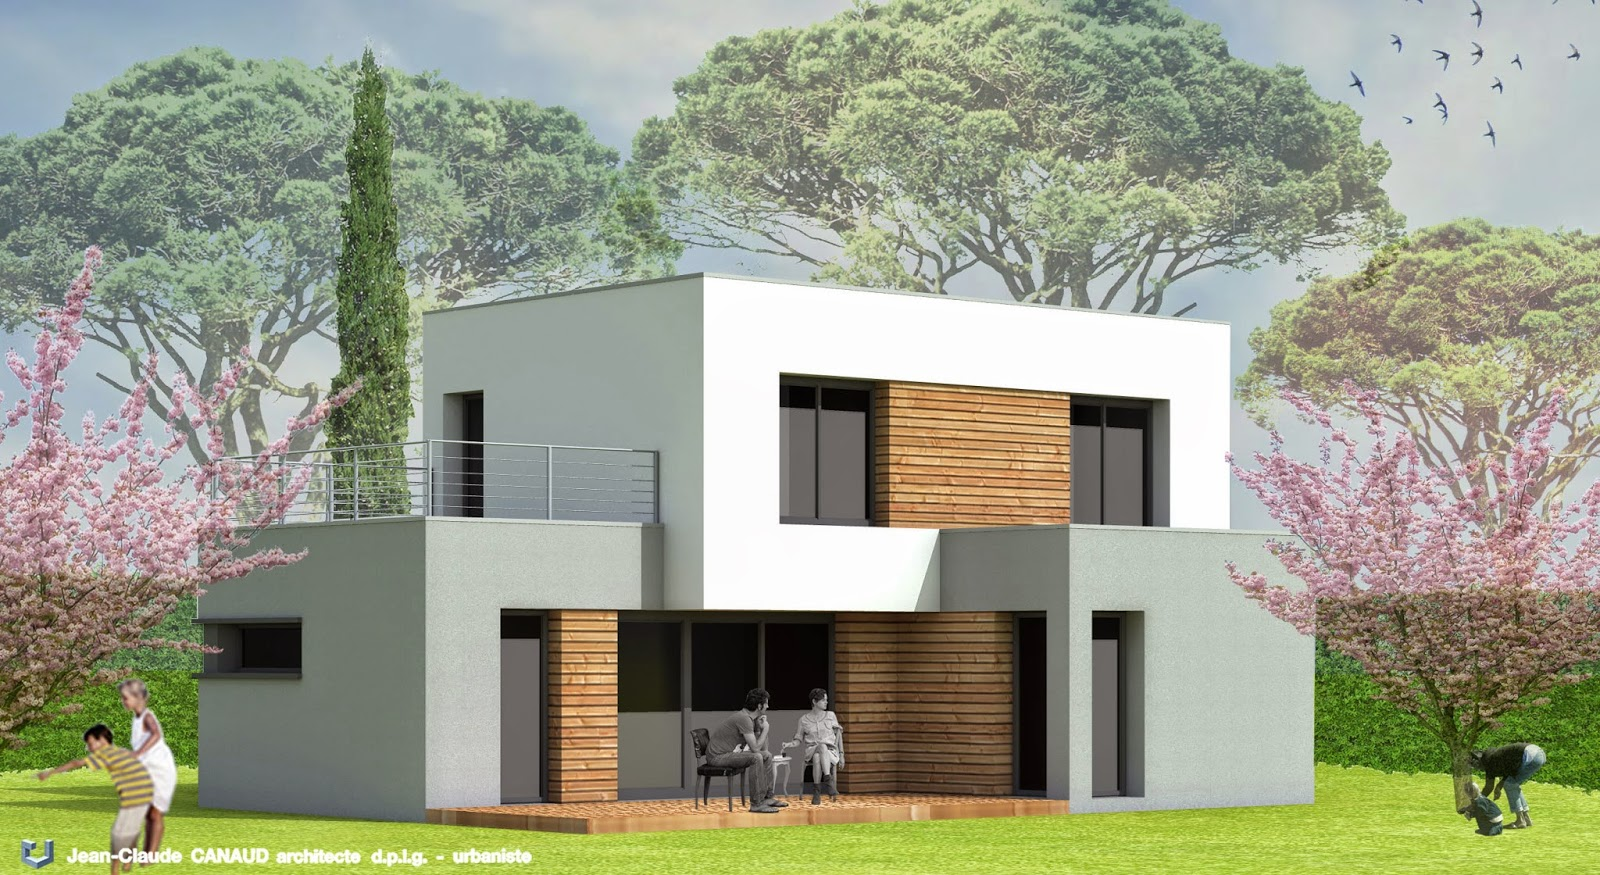 canaud architecte projets de villas contemporaines gard. Black Bedroom Furniture Sets. Home Design Ideas